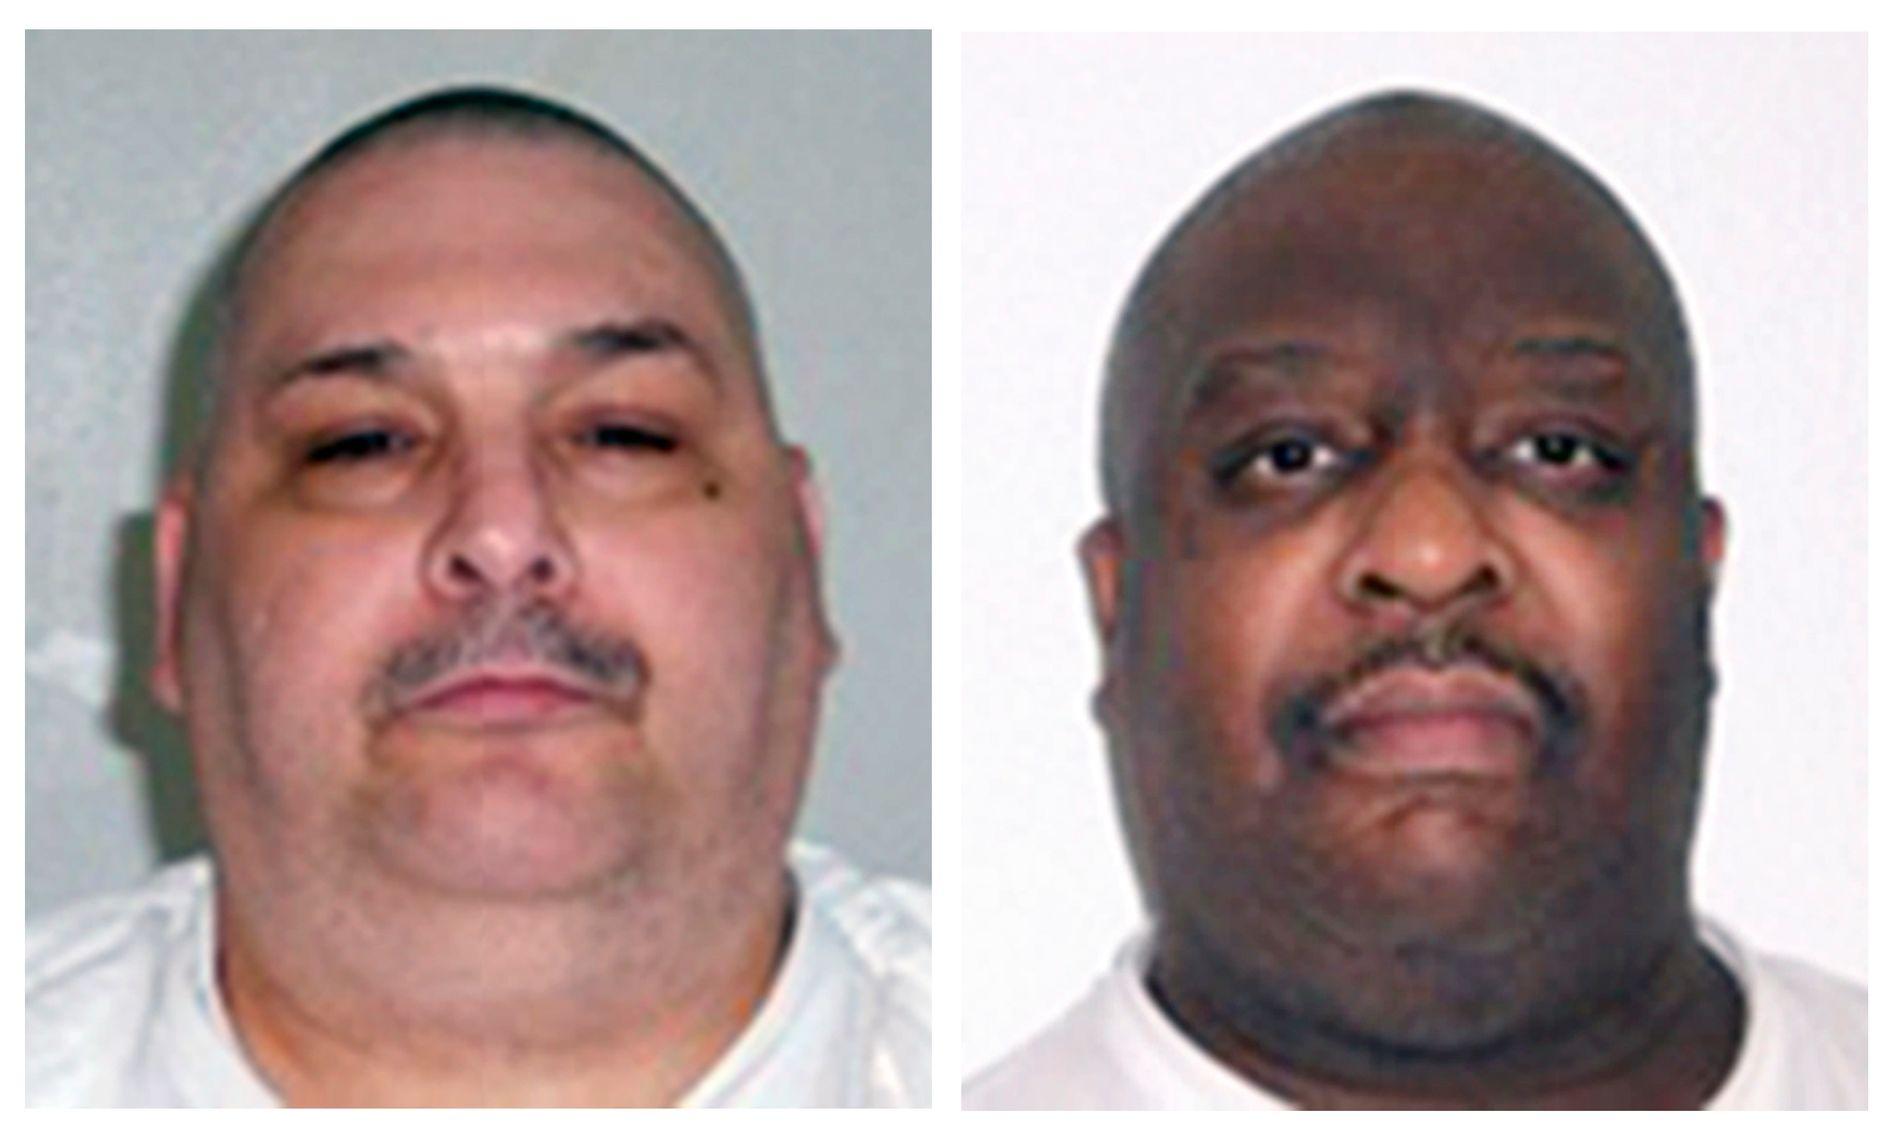 DØDSDØMT: Jack Jones (t.v.) og Marcel Williams er begge dømt til døden for voldtekt og drap.